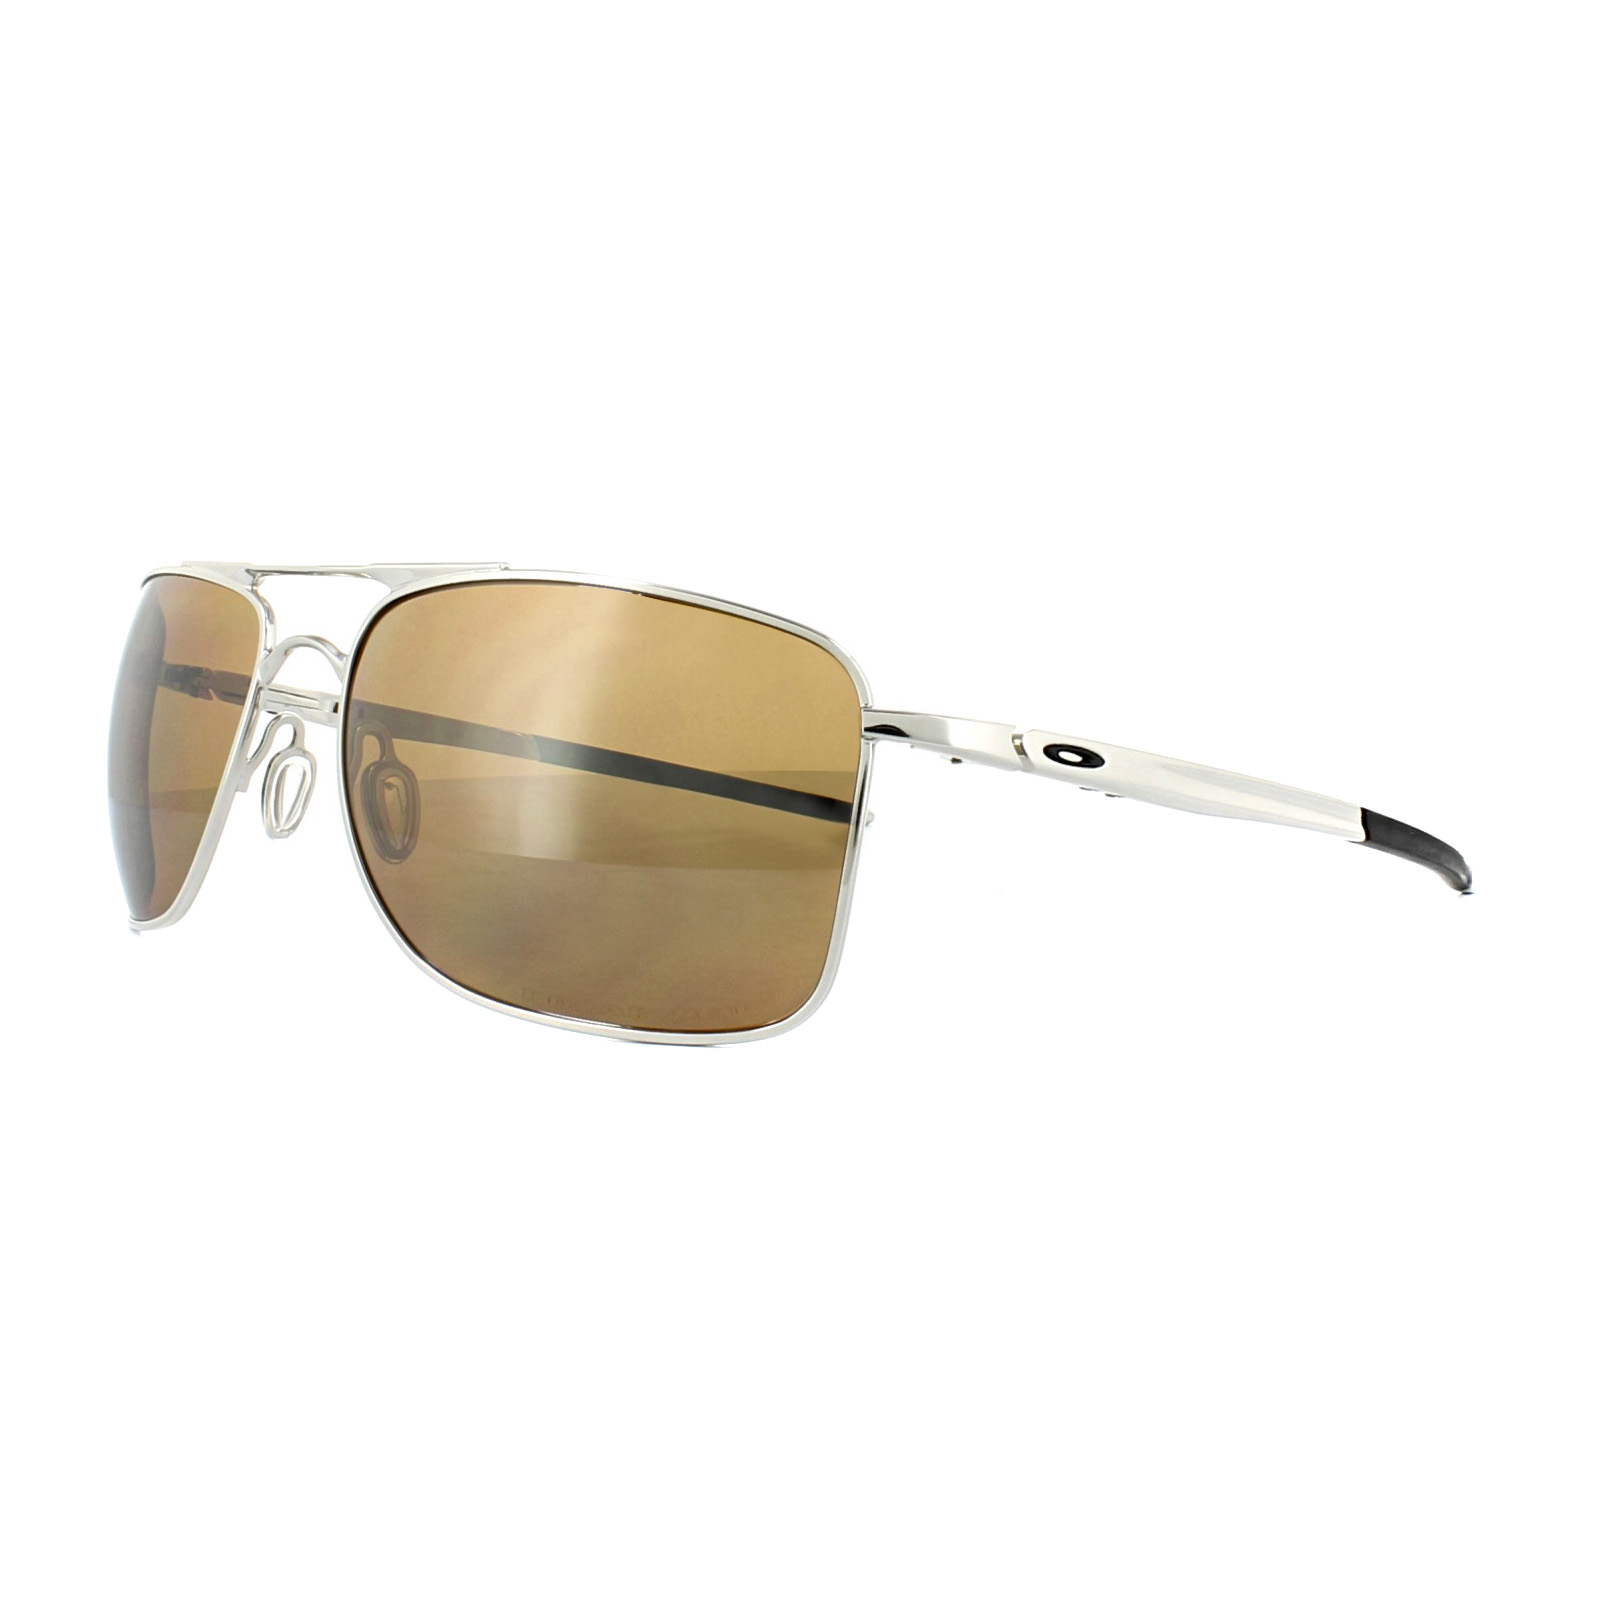 Oakley Gauge 8L Iridium Polarized Sonnenbrille Chrom Q1iuG